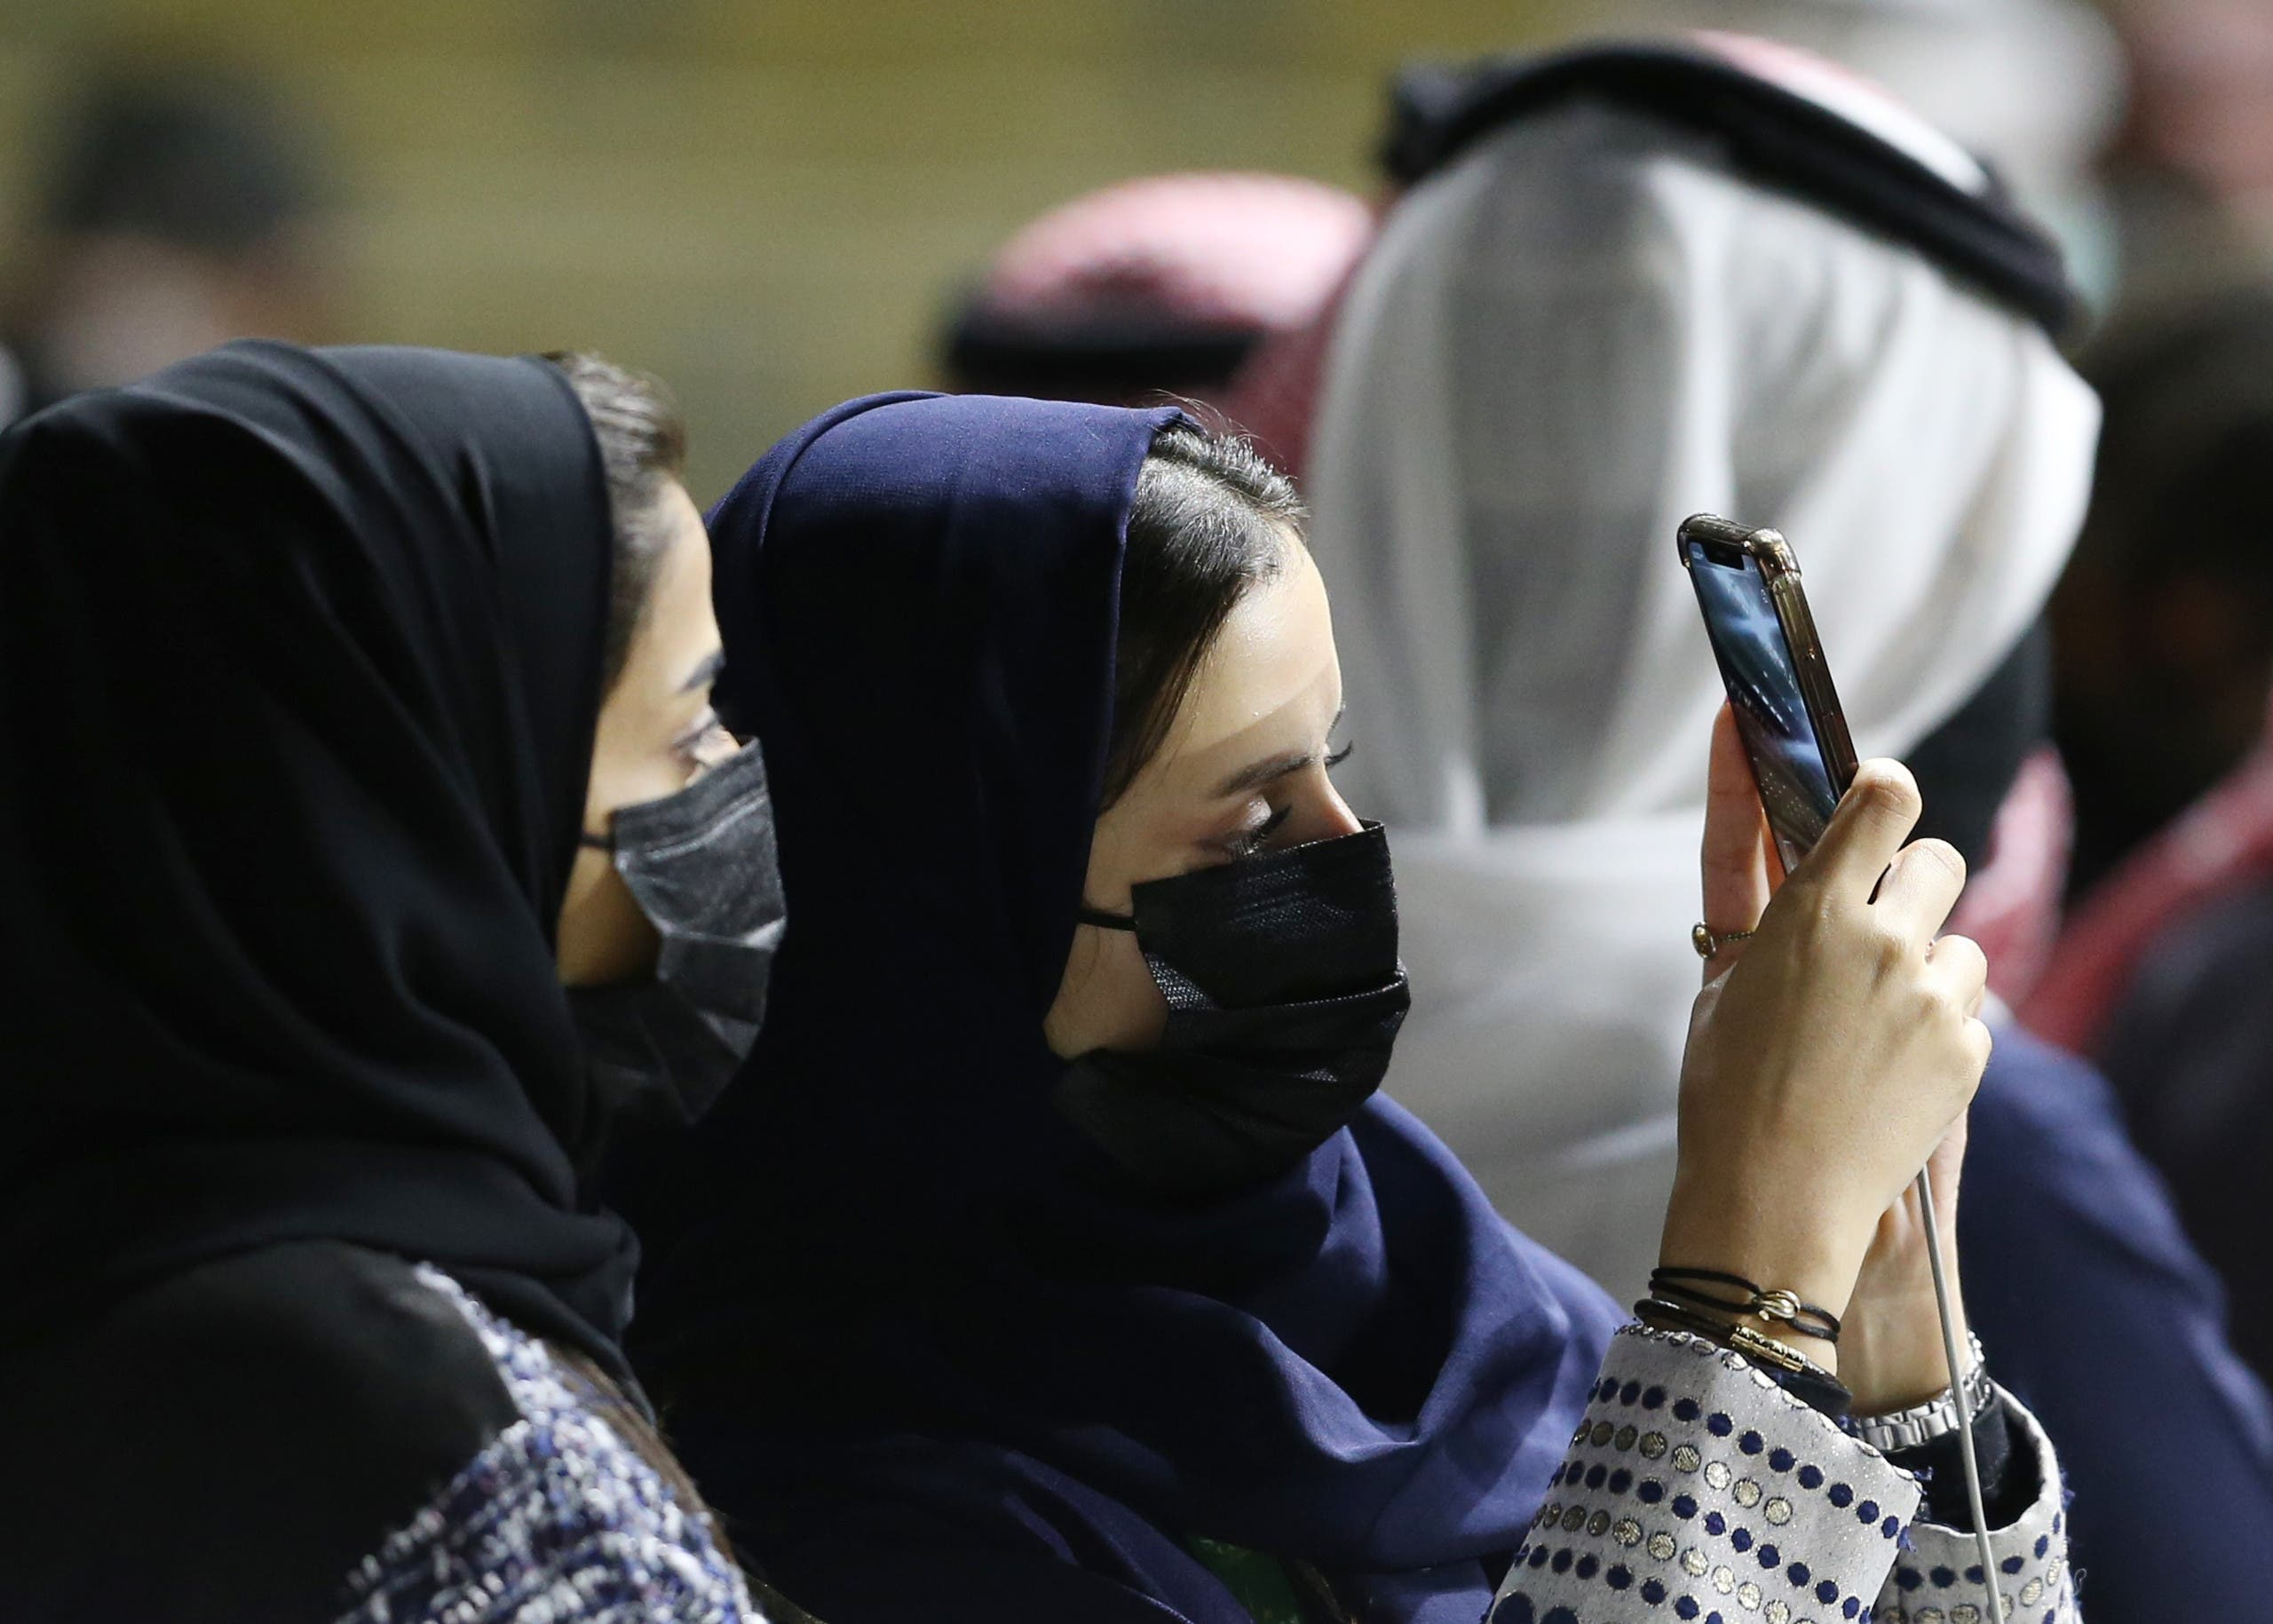 Spectators at the racetrack take a selfie. (Reuters)